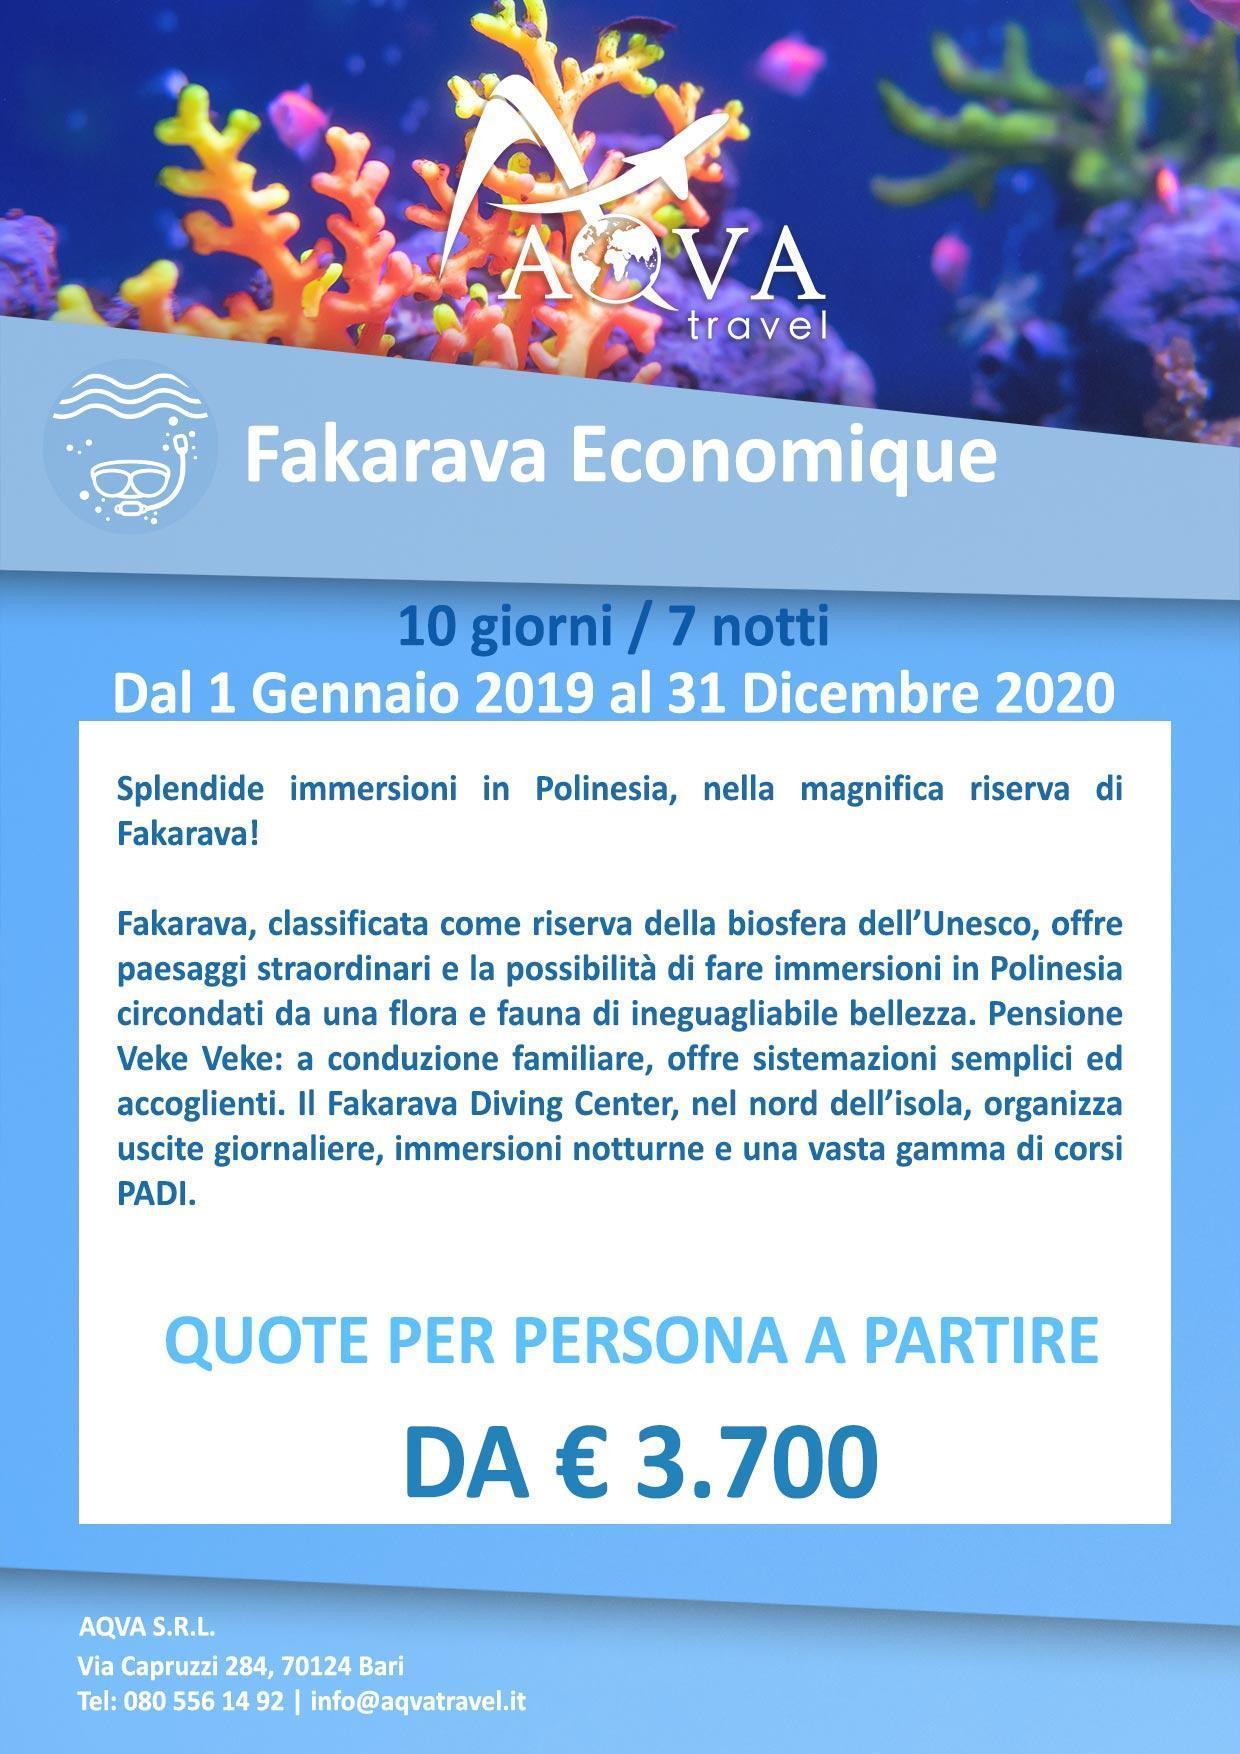 Subacquea-Fakarava-Economique02-subacquea-offerte-agenzia-di-viaggi-Bari-AQVATRAVEL-it